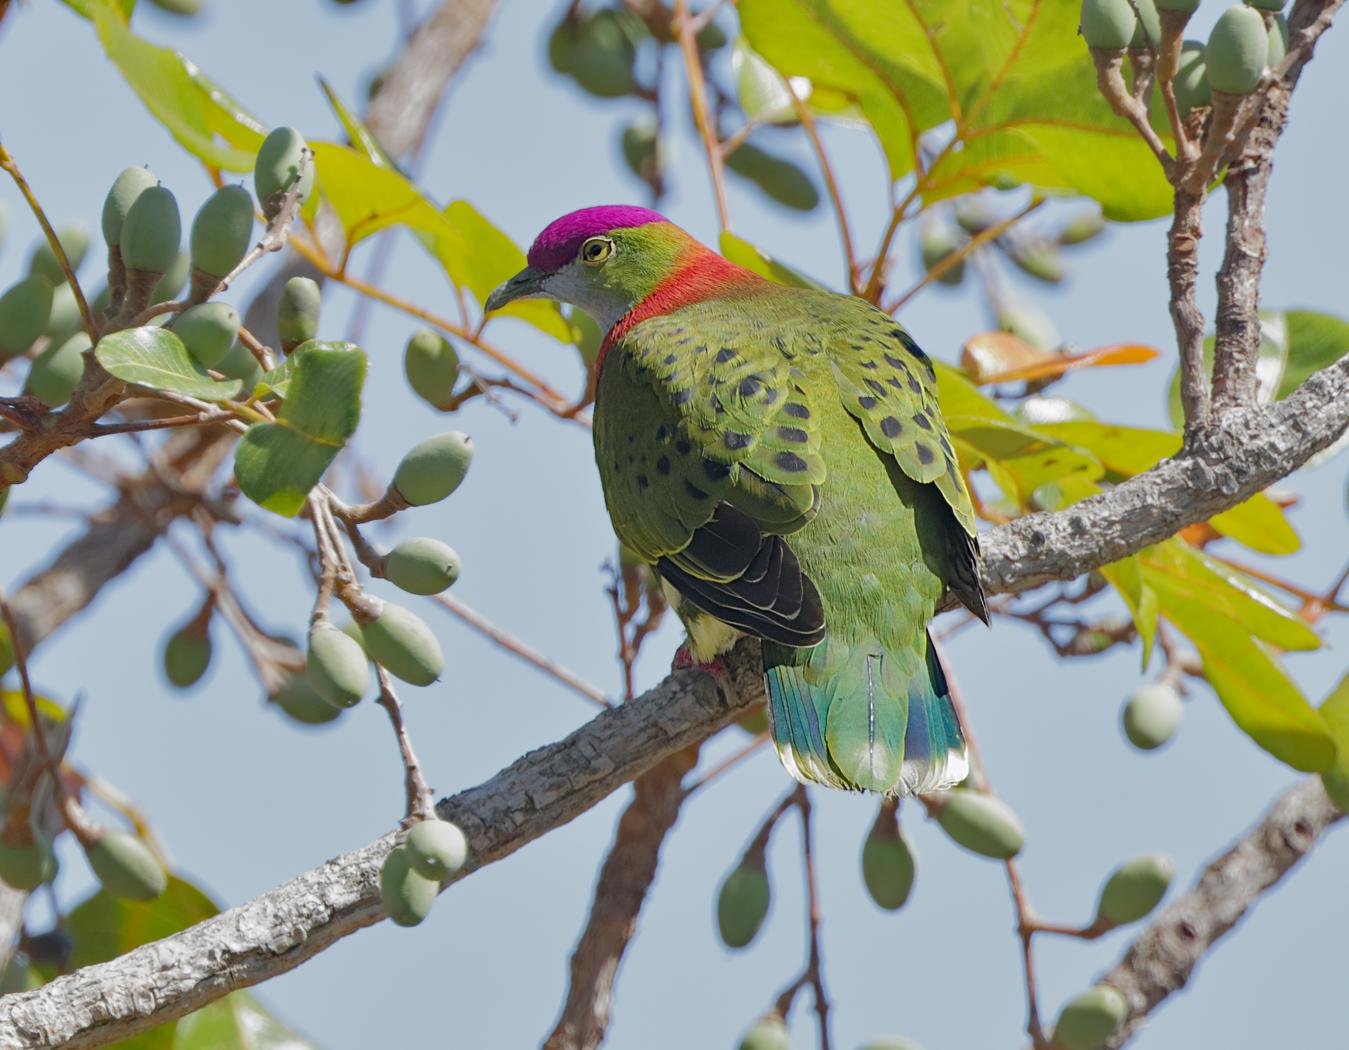 Superb Fruit-Dove